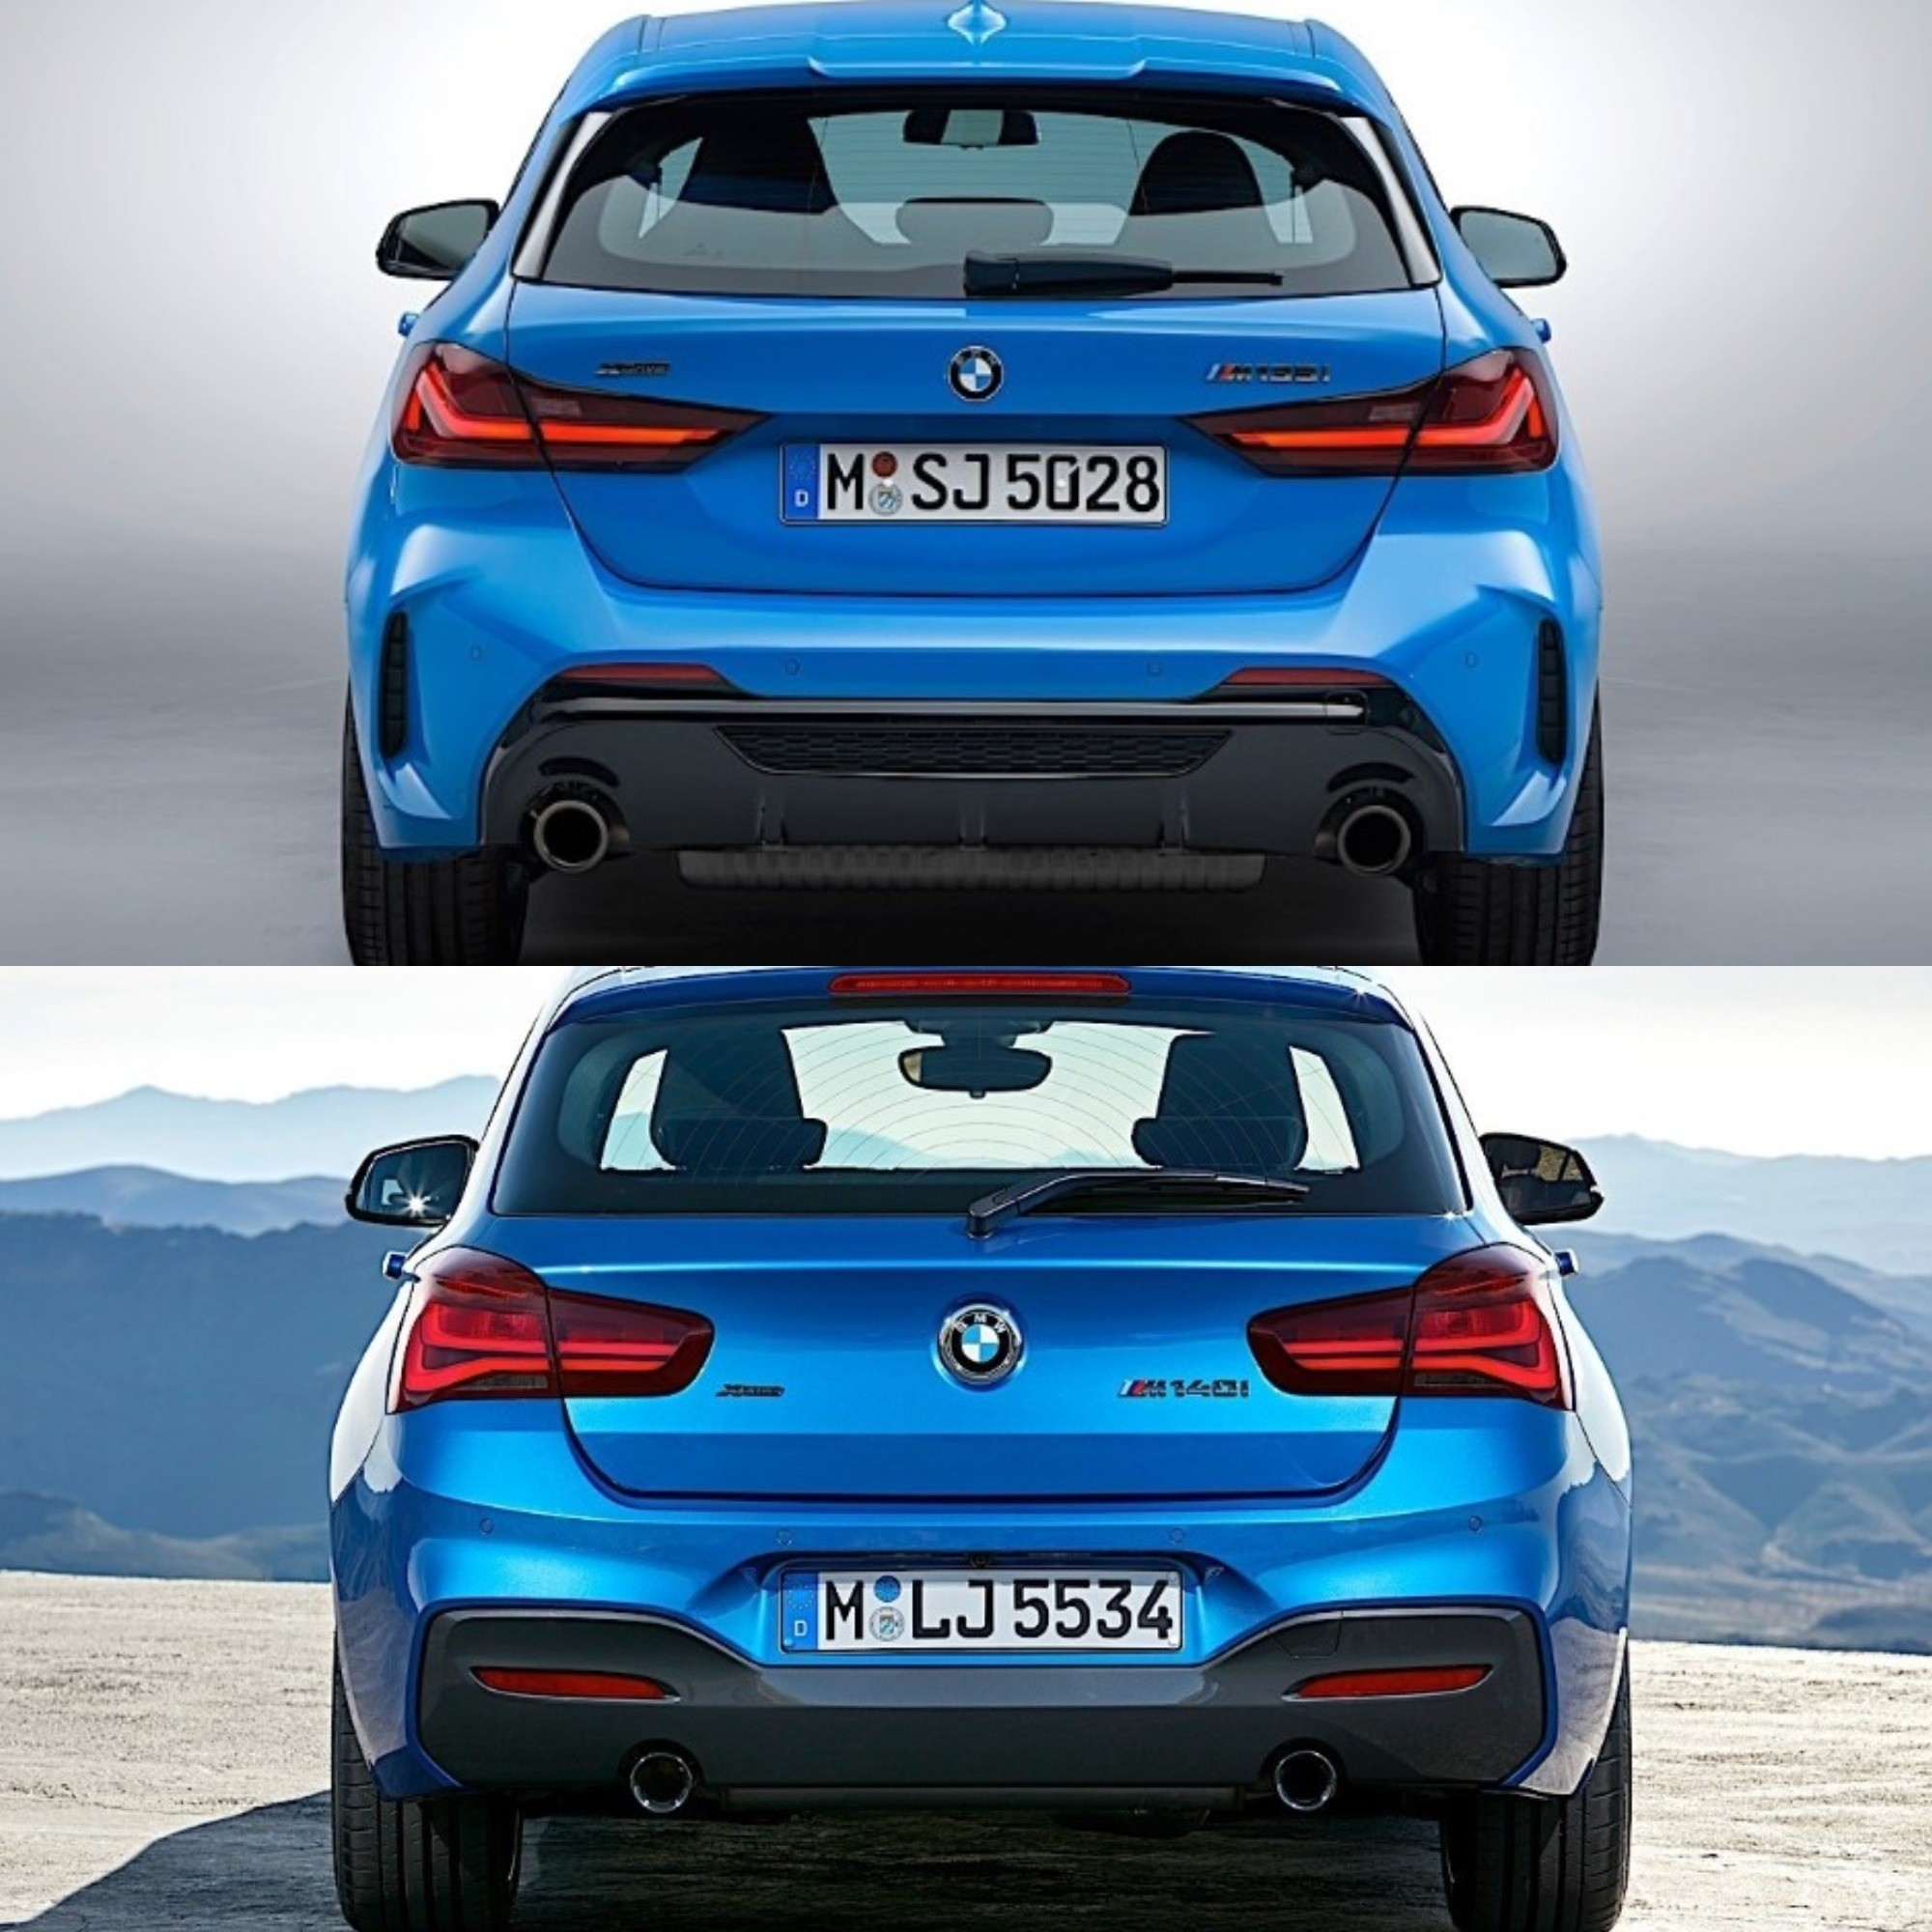 Bmw 2020: Photo Comparison: 2020 BMW 1 Series Vs. 2017 BMW 1 Series